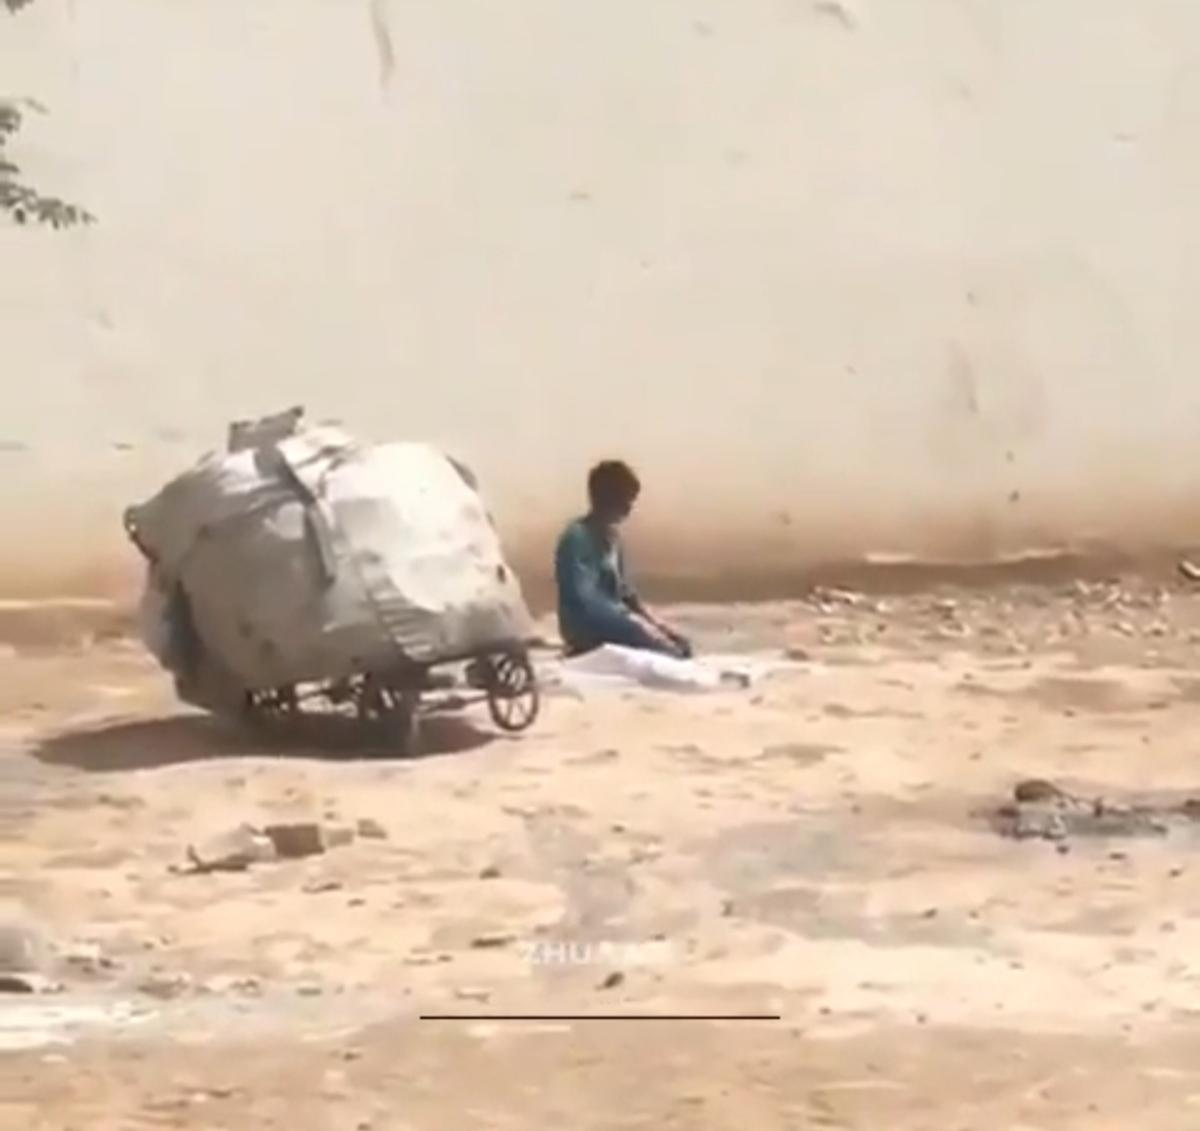 نماز کودک کار + ویدئو